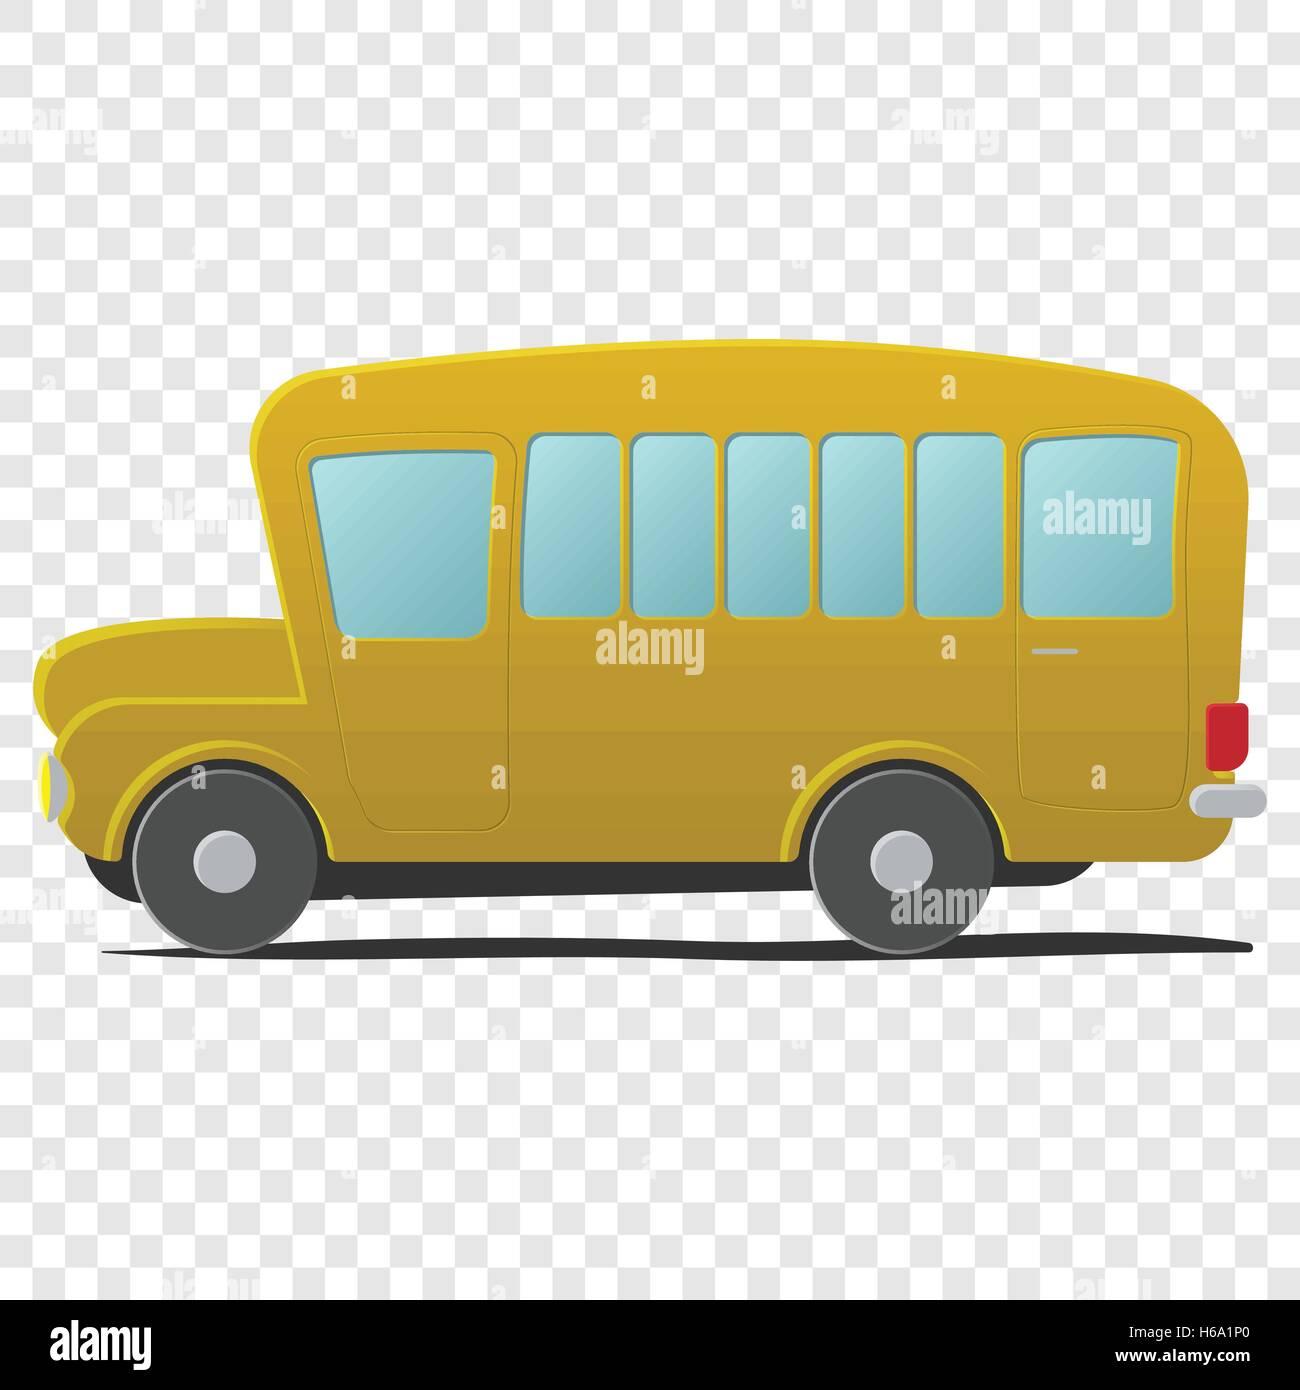 charter school stock vector images alamy rh alamy com Bus Driver Clip Art Shuttle Bus Clip Art